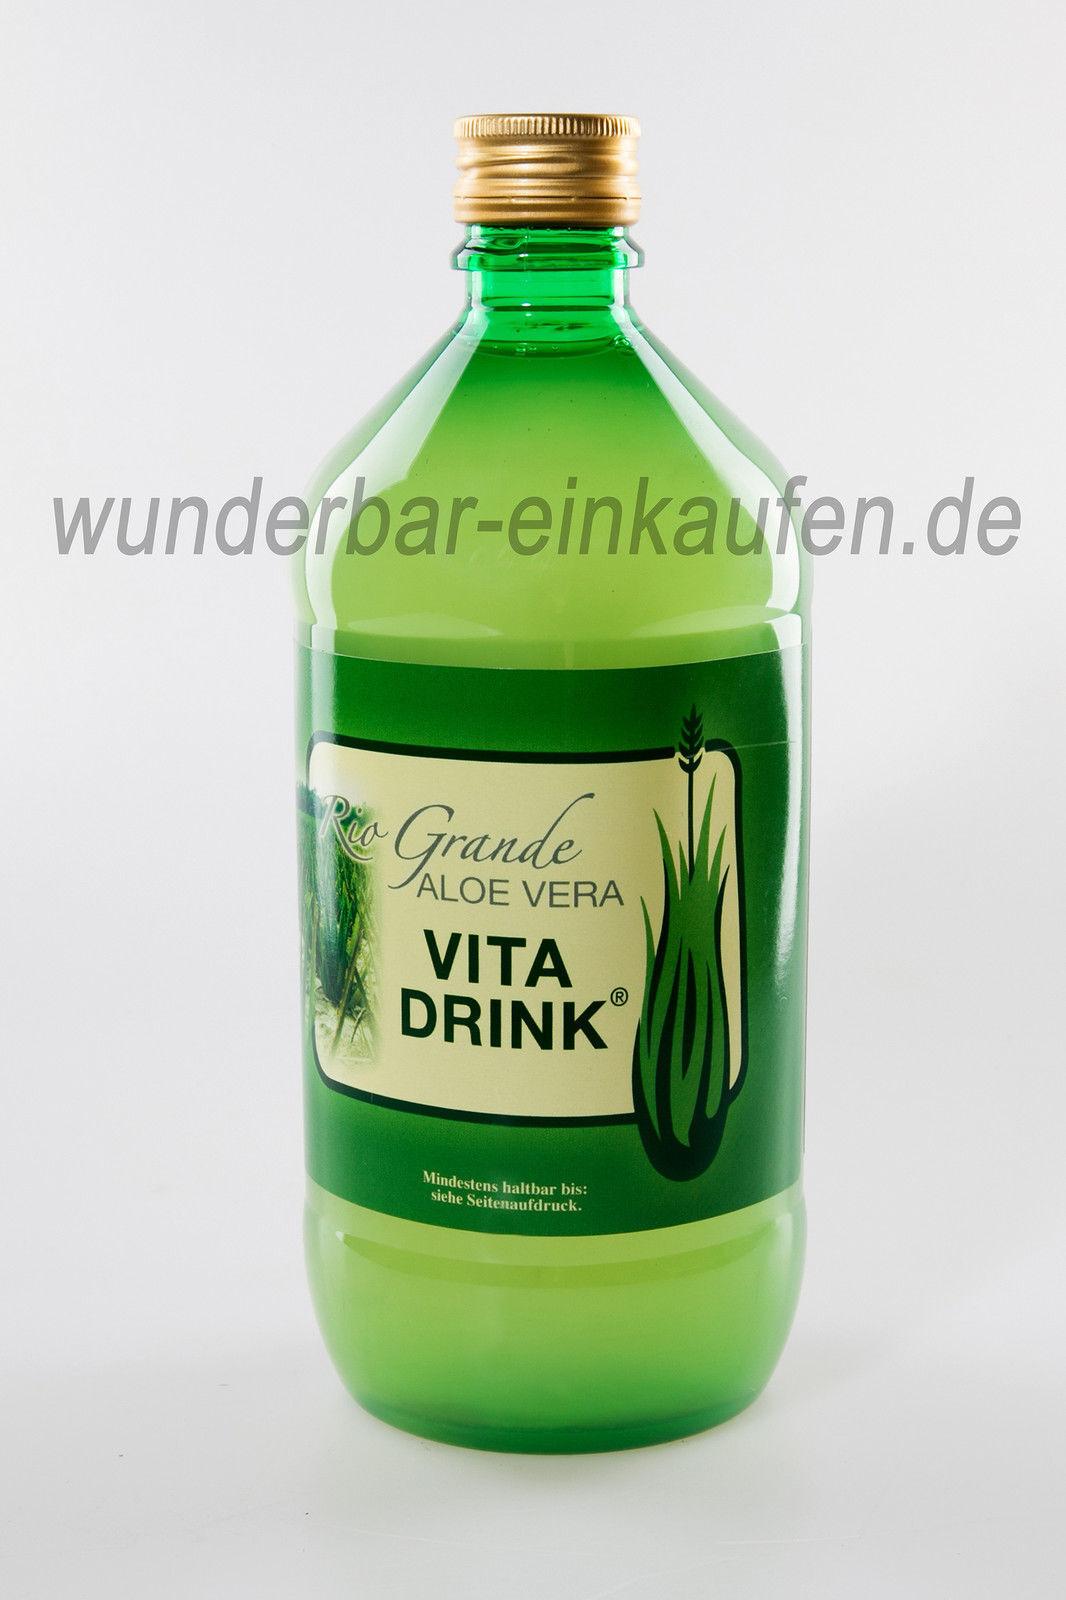 Aloe Vera Vita Drink Saft  aloinfrei Lailique Nahrungsergänzung Farmer House